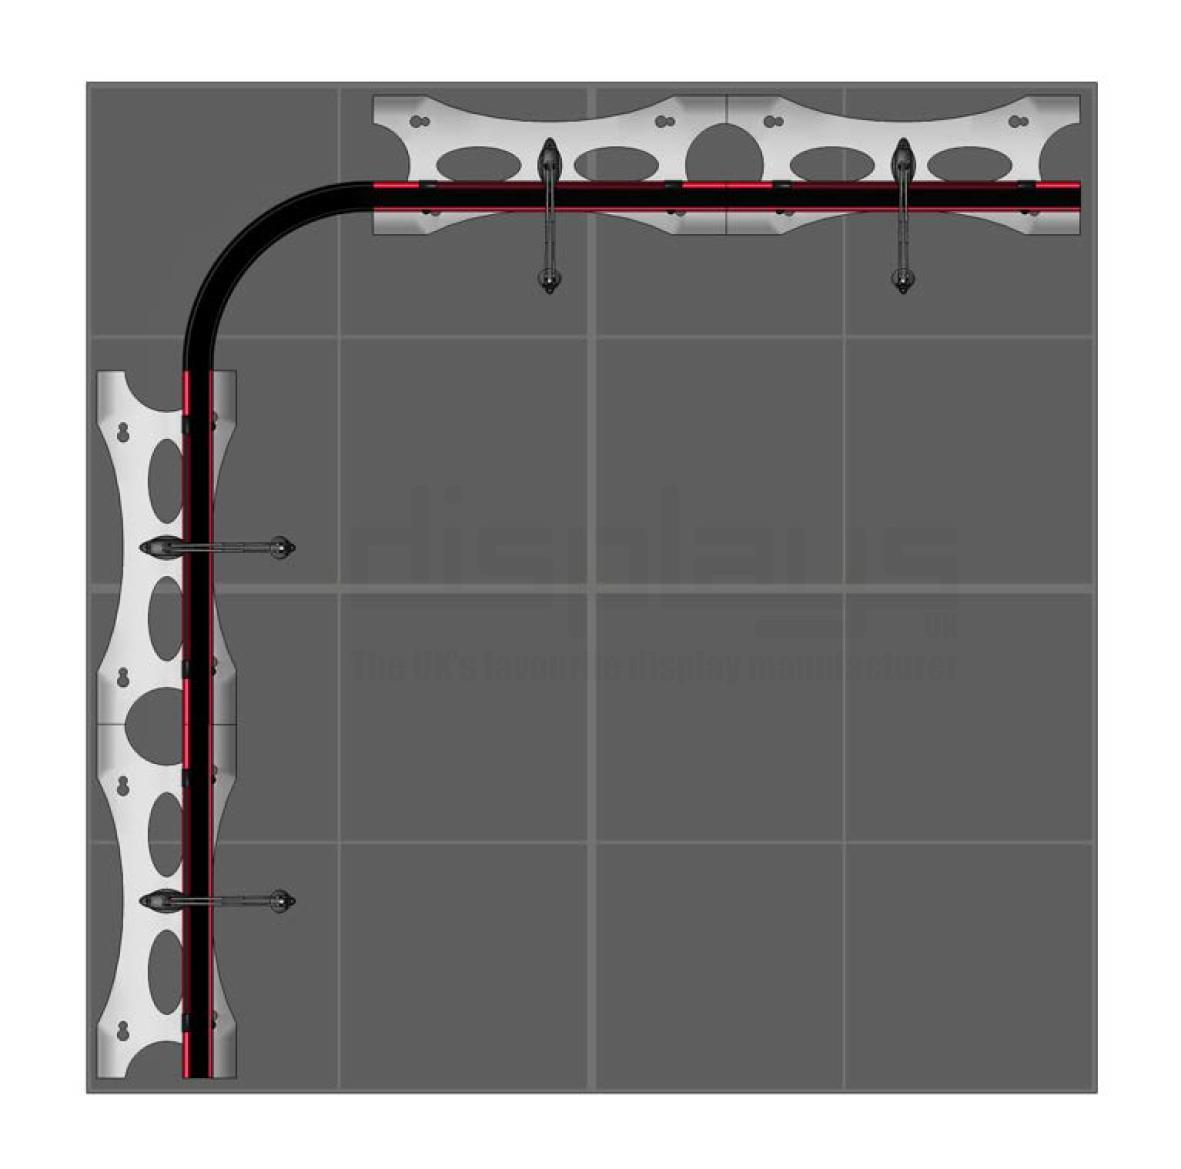 Twist 2m x 2m Flexible Banner Stand Kit 2